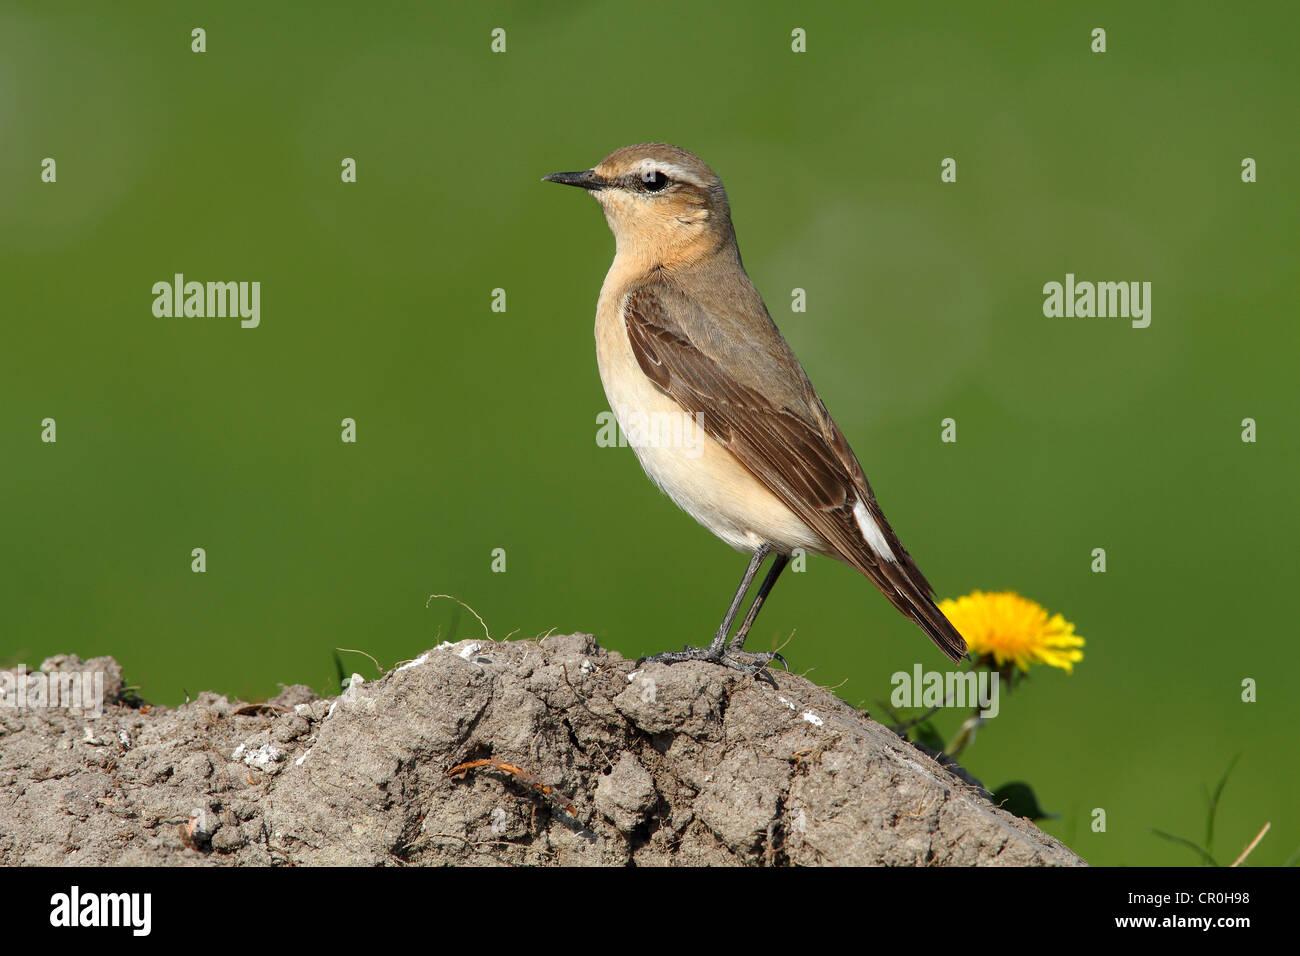 Wheatear (Oenanthe oenanthe) - Stock Image